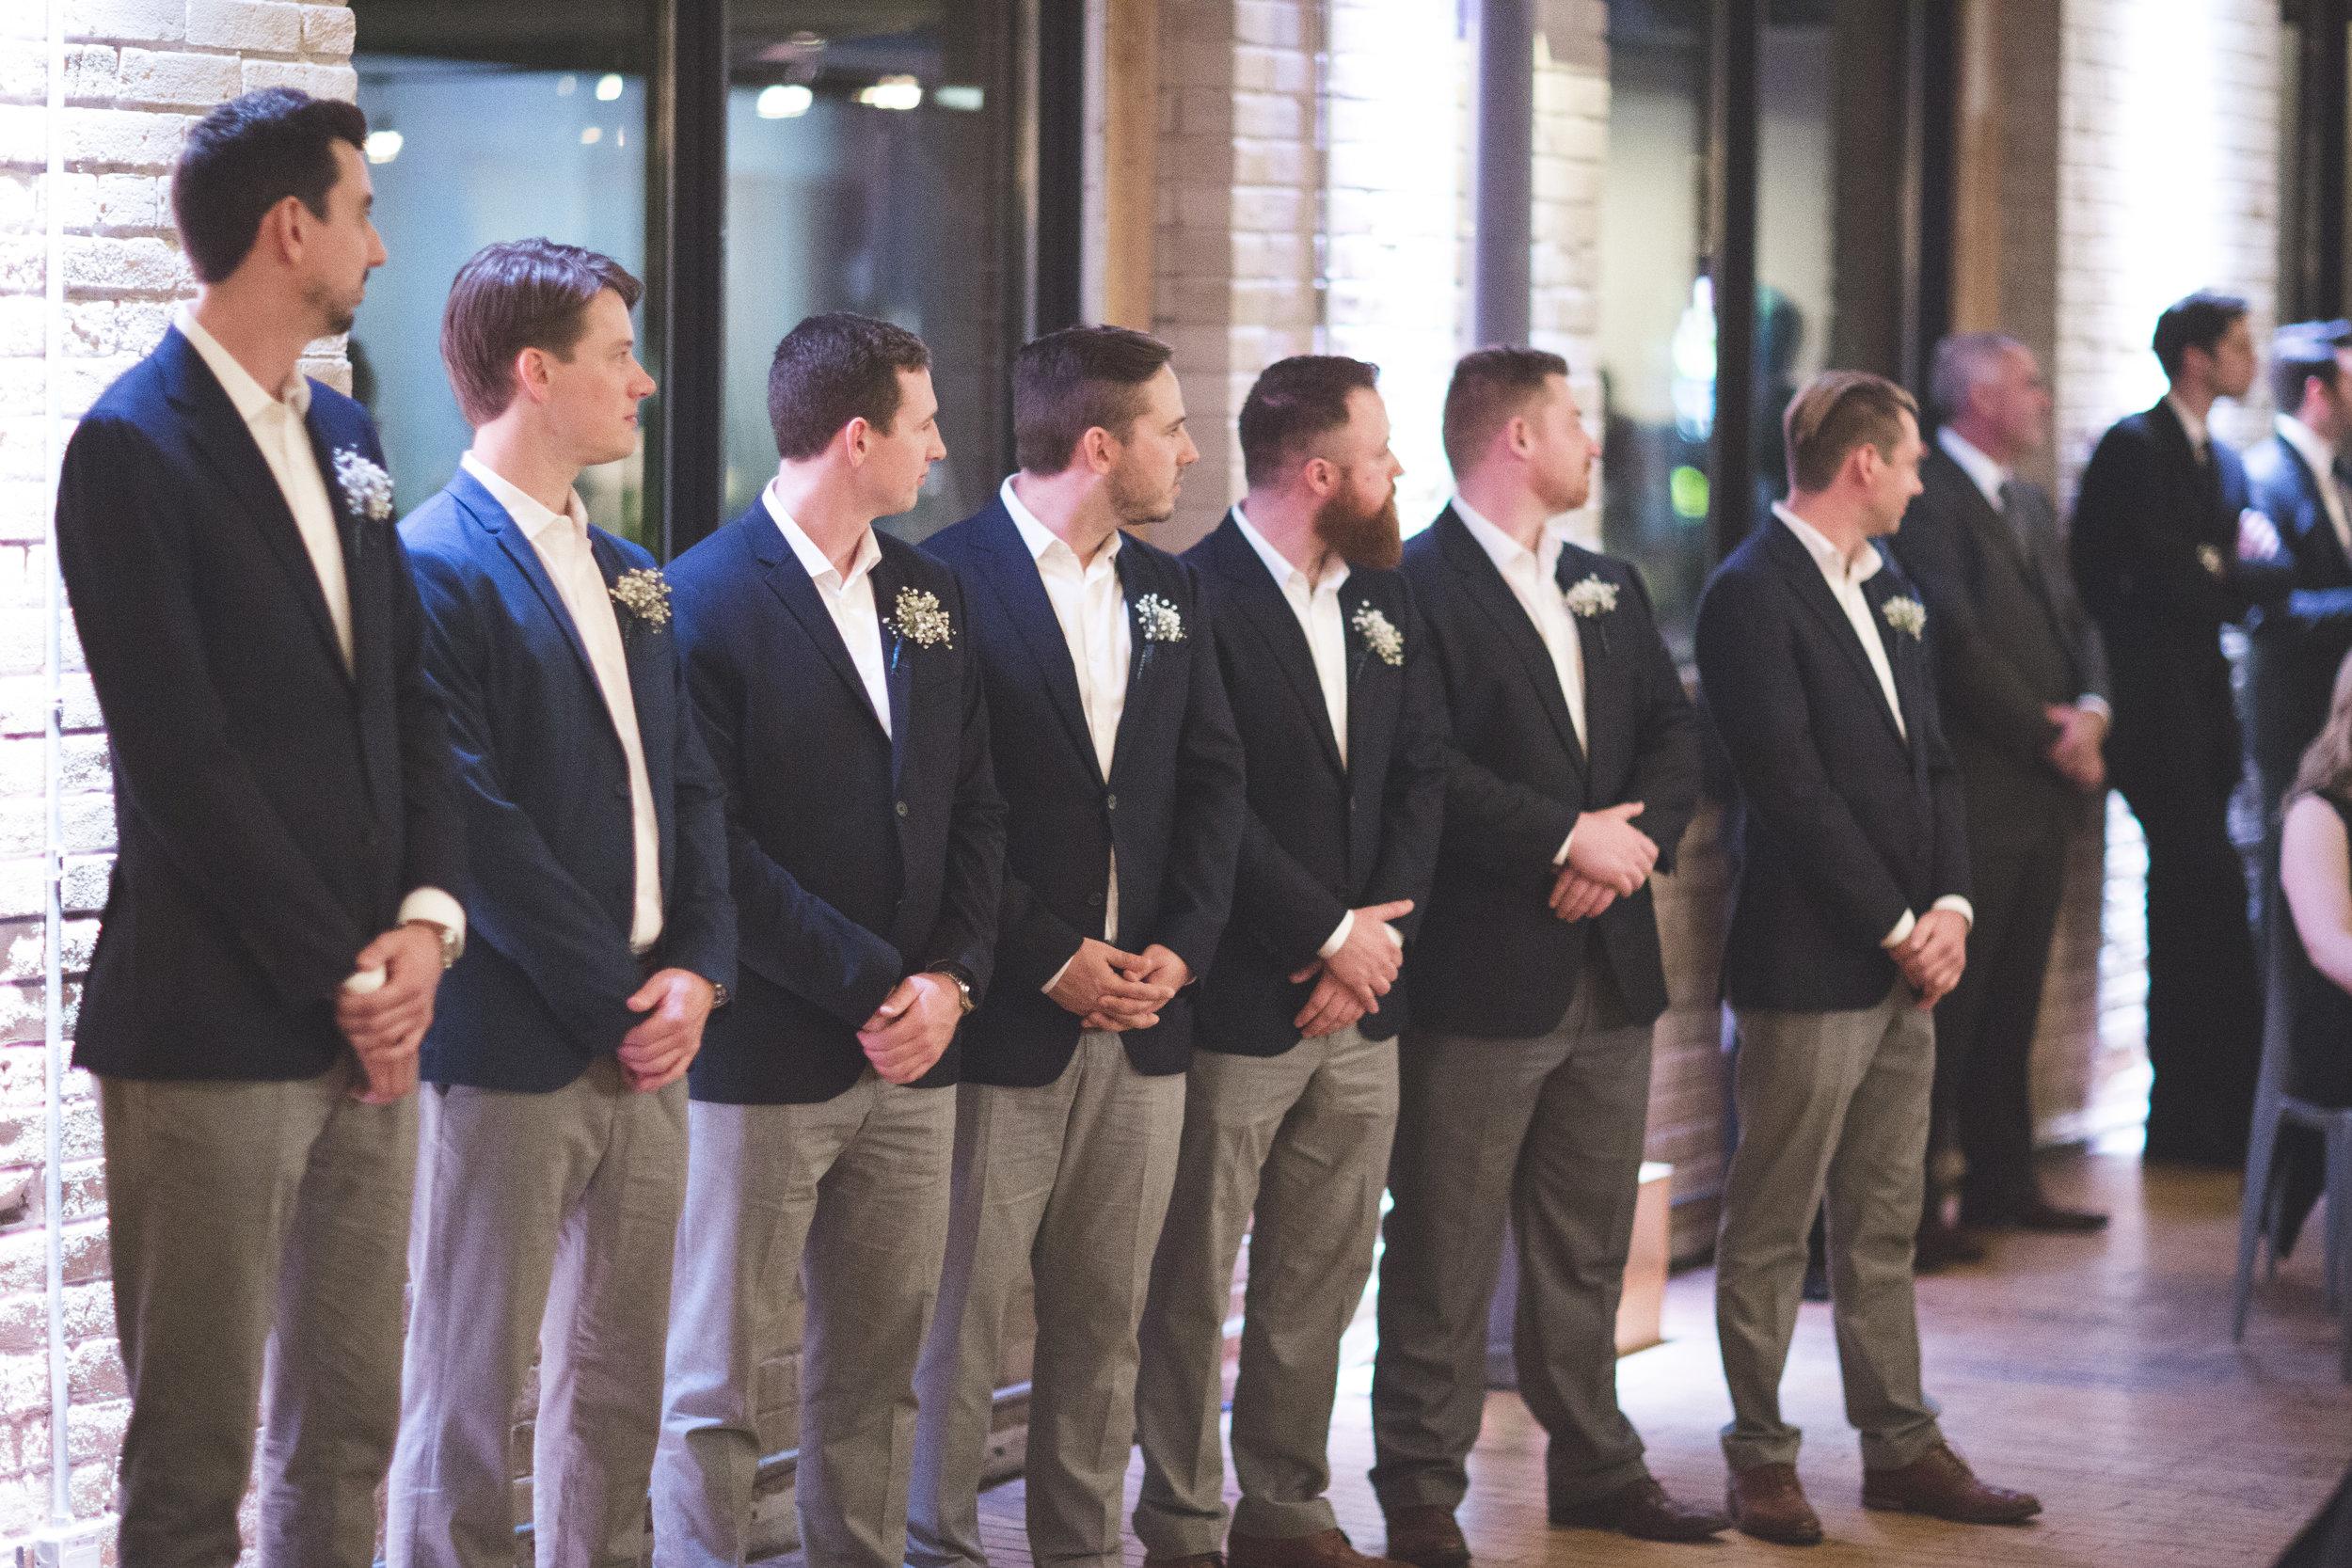 Groomsmen waiting for the bride.